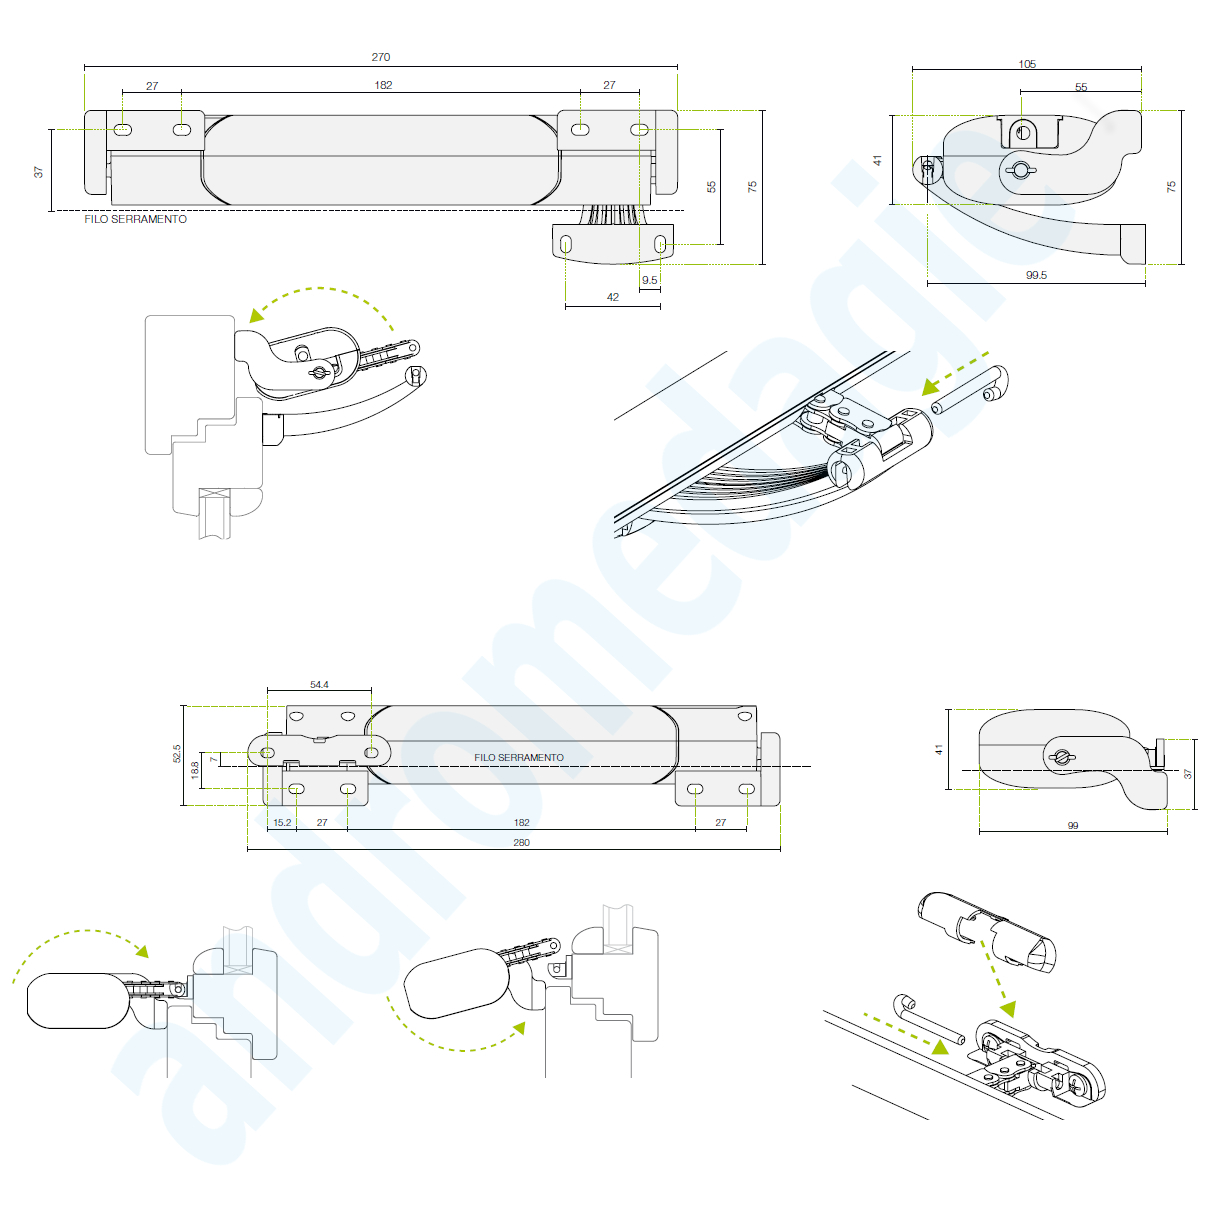 SMART 230V BIANCO MOWIN Motore a catena per finestre